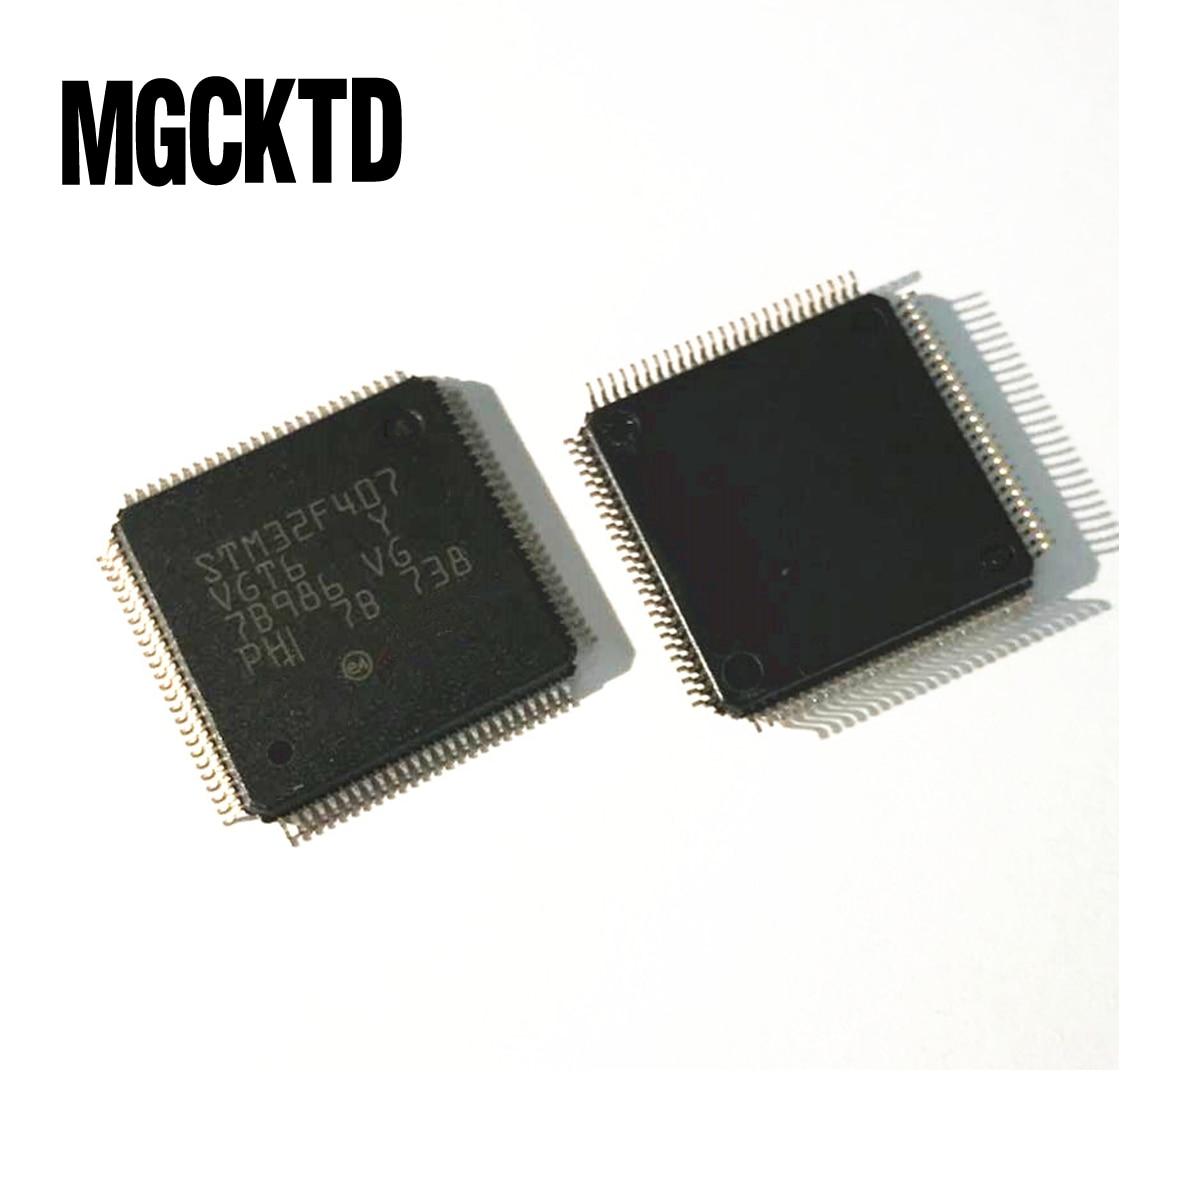 100% New 2pcs STM32F407VGT6 STM32F407 ST MCU 32BIT 1MB FLASH 100LQFP